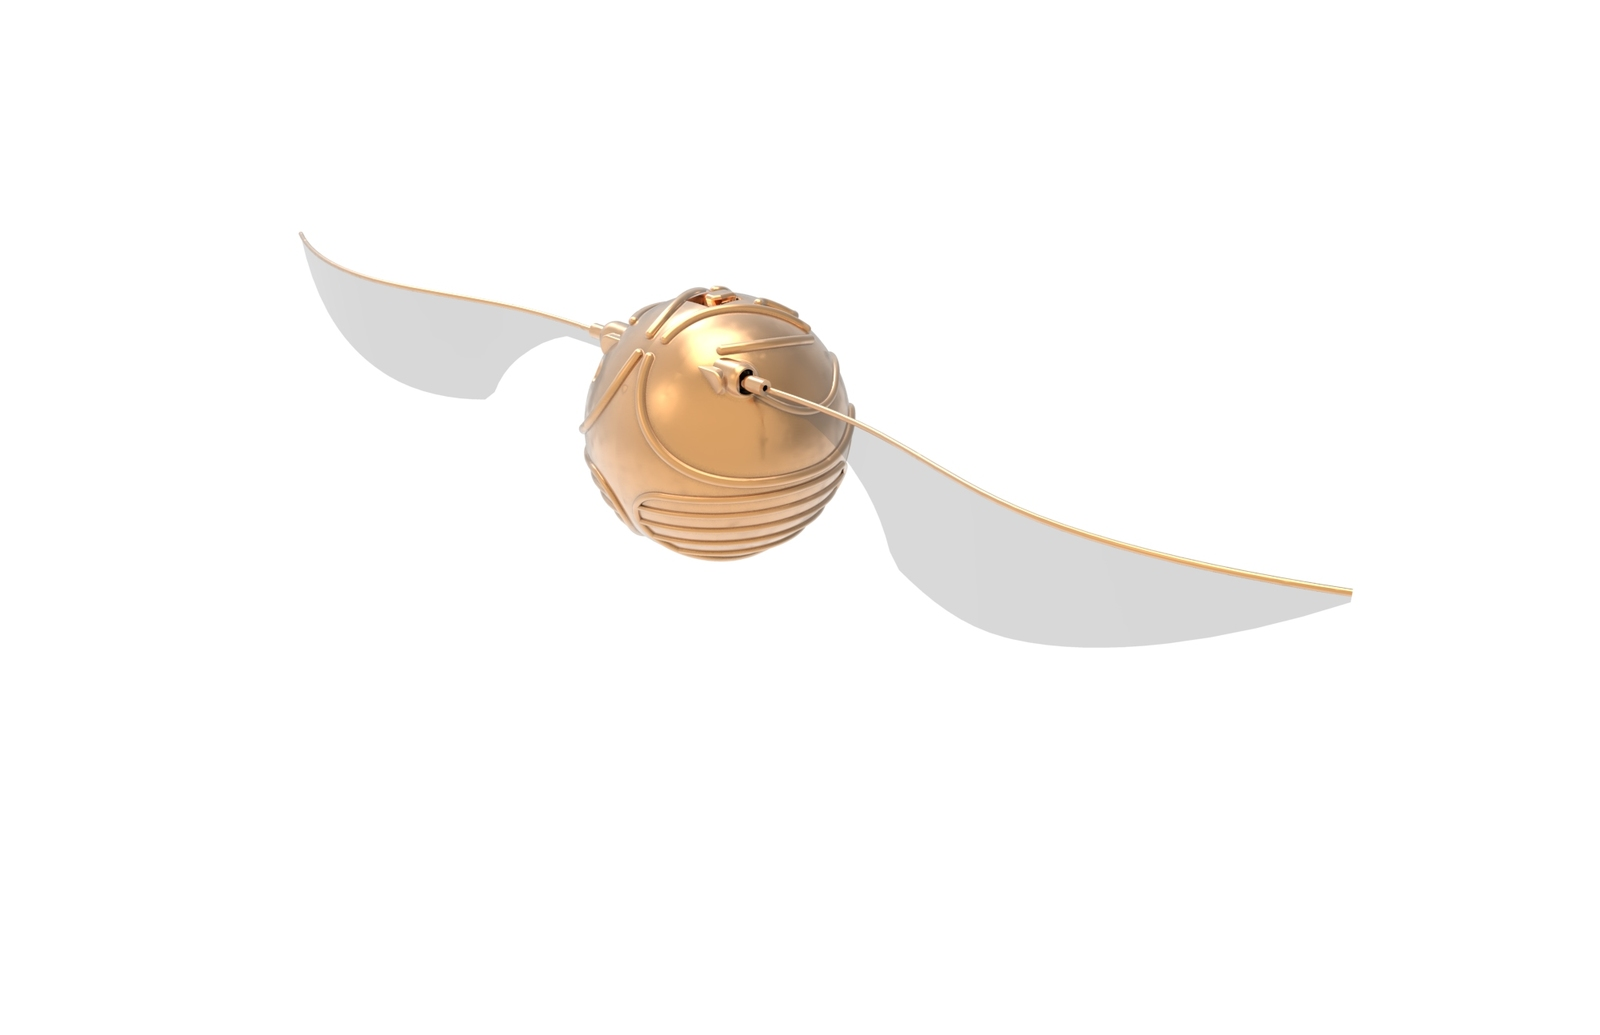 Harry Potter: Mystery Flying Snitch image